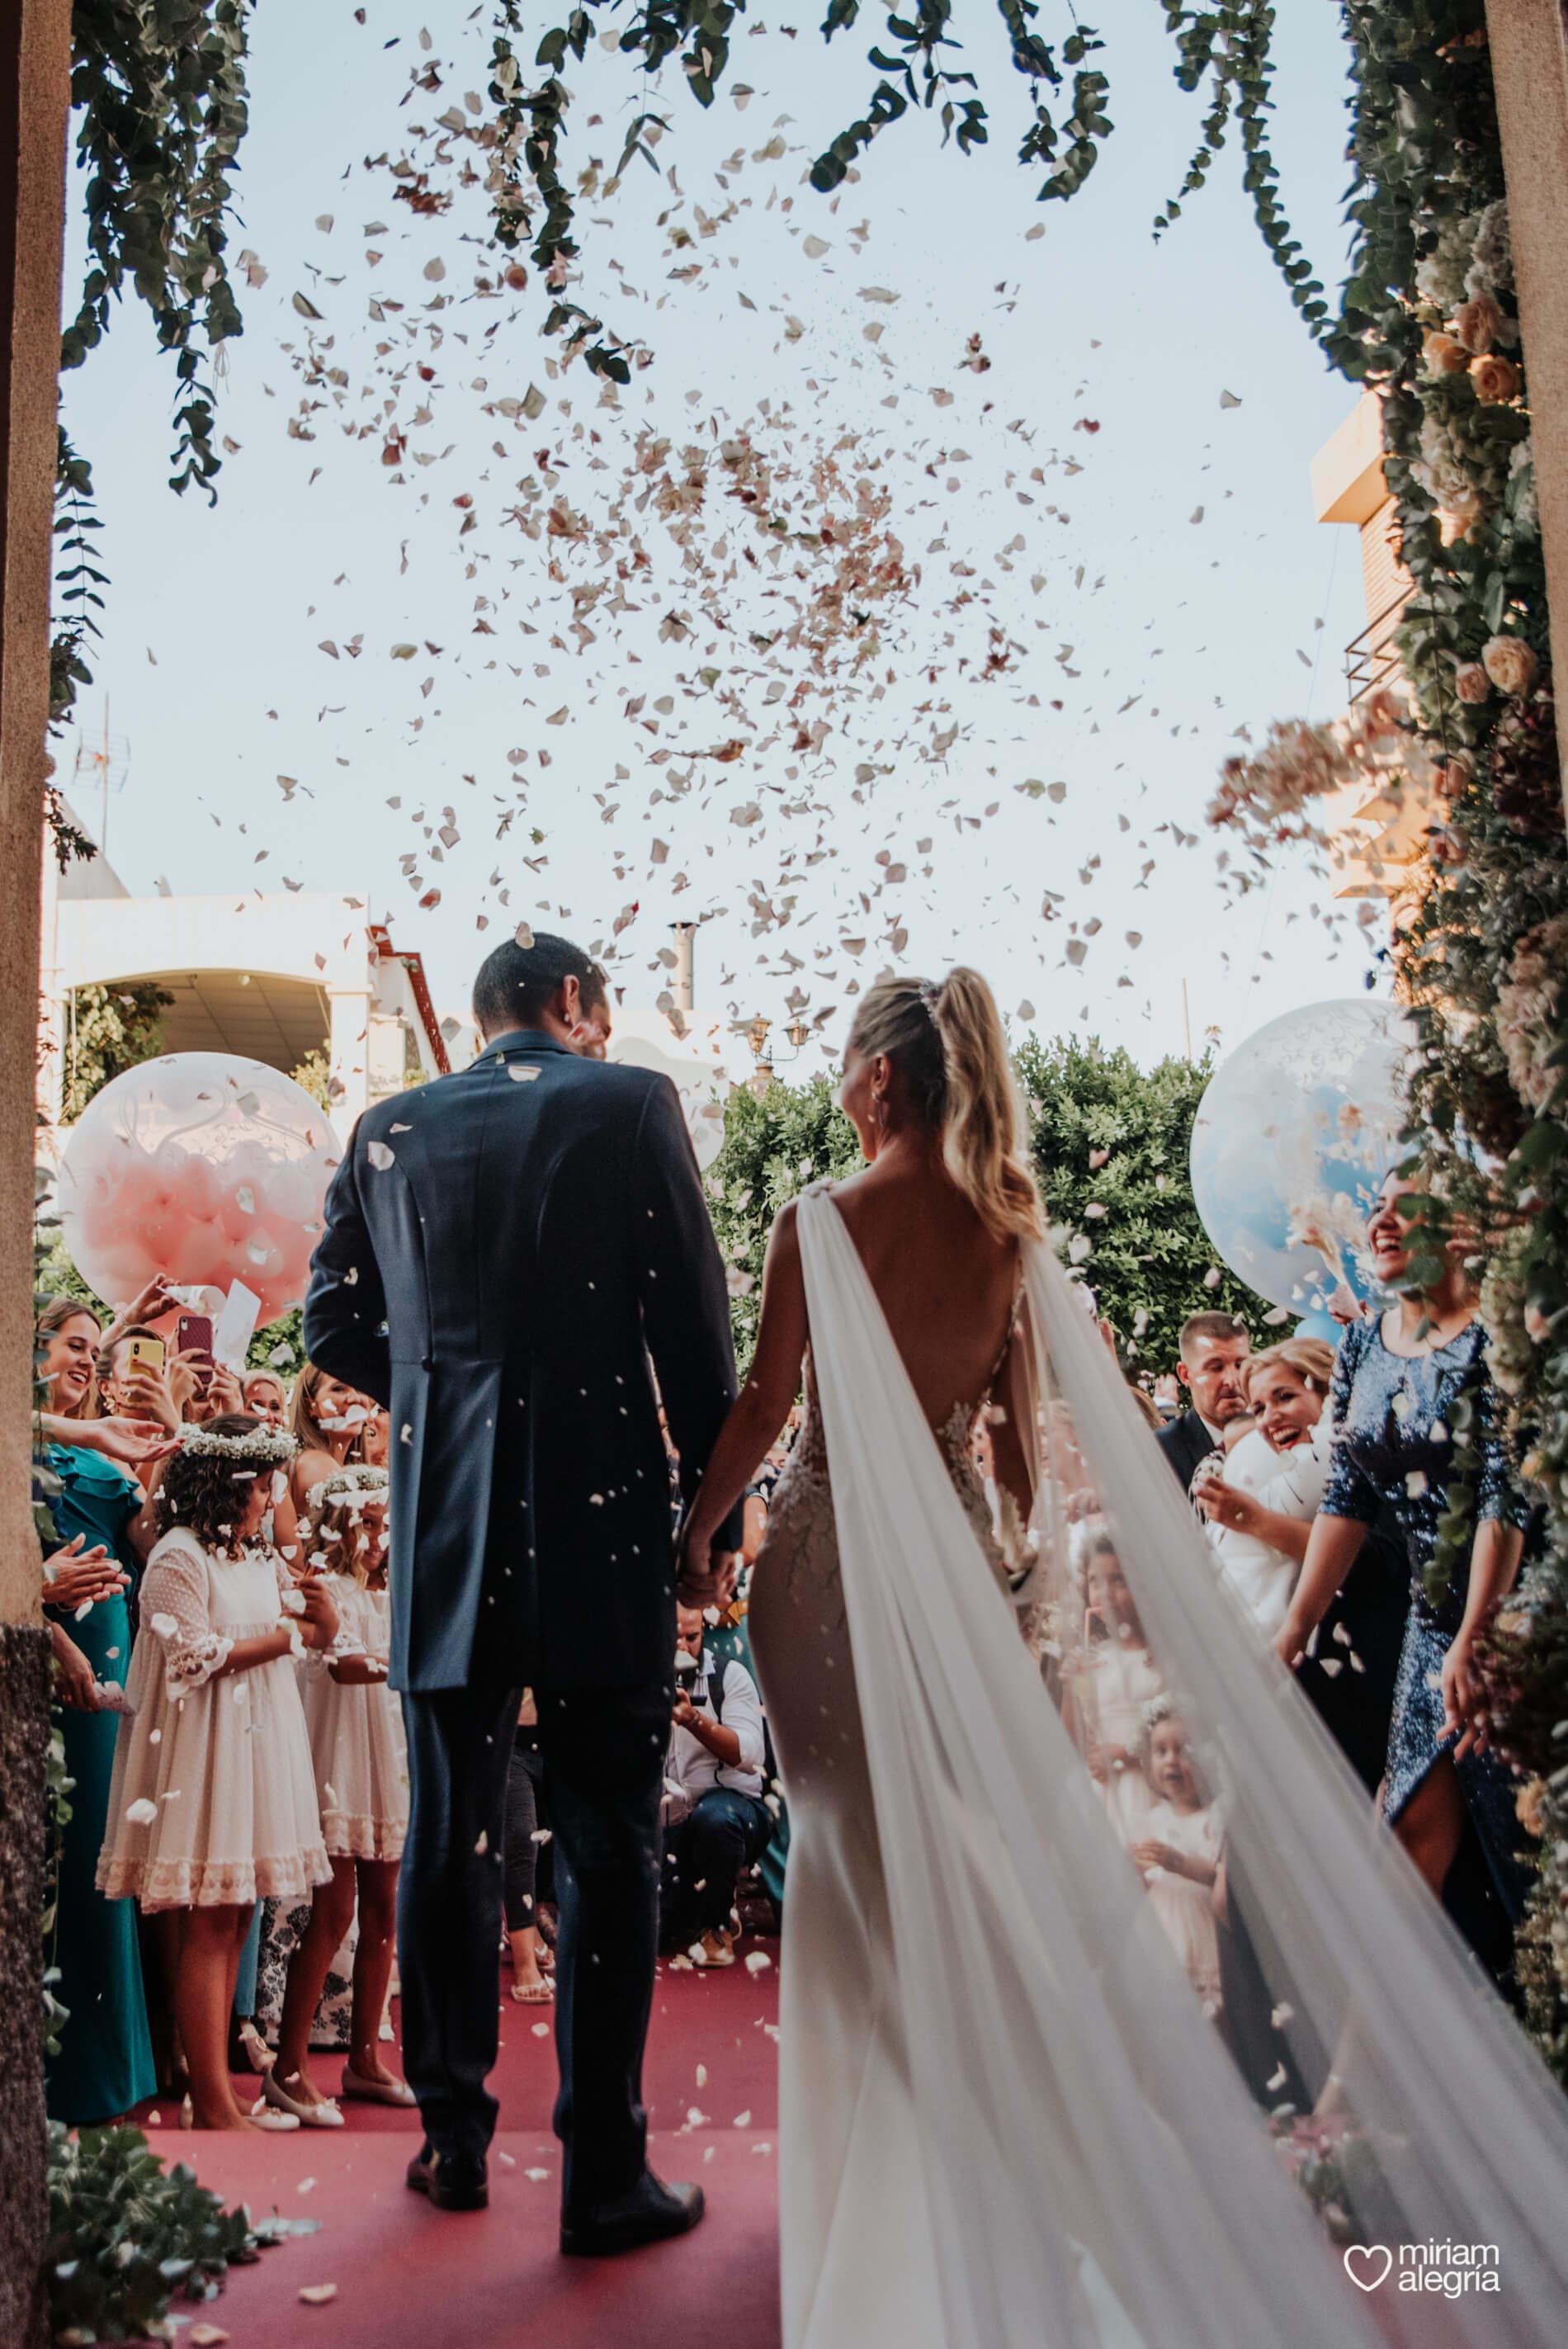 boda-en-almeria-miriam-alegria-133